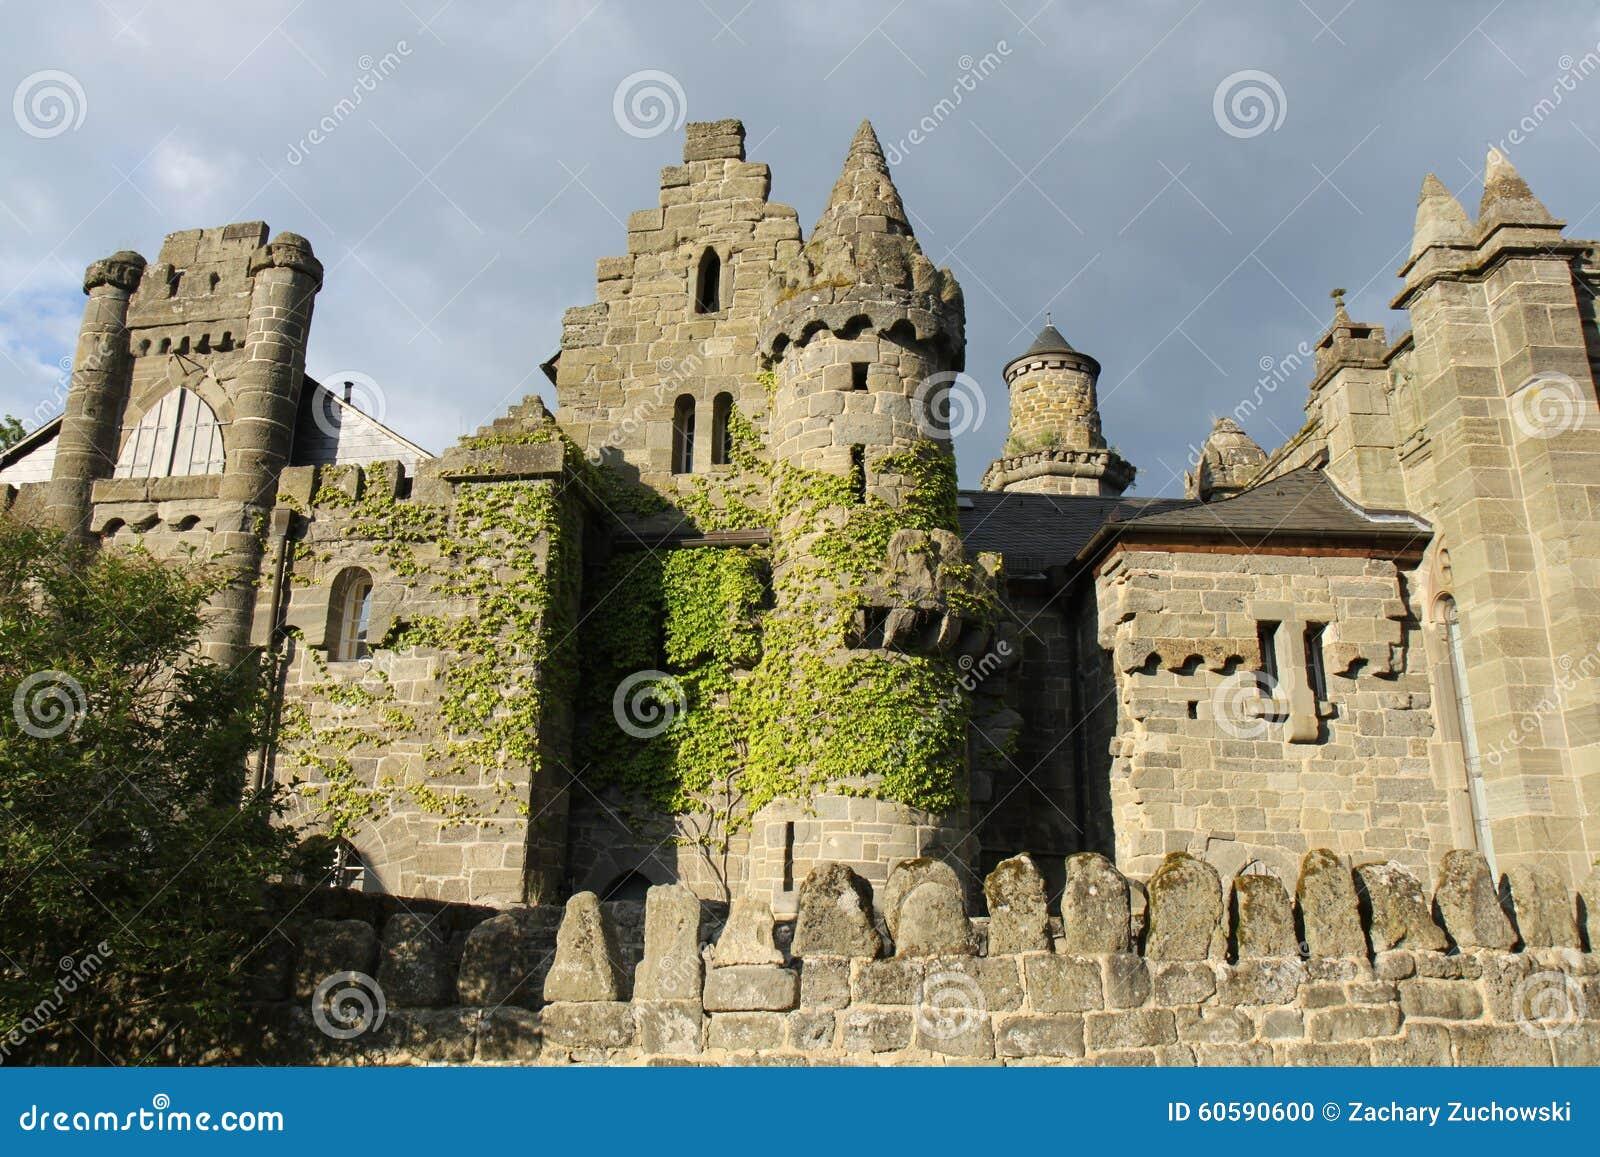 Castillo de Lowenburg